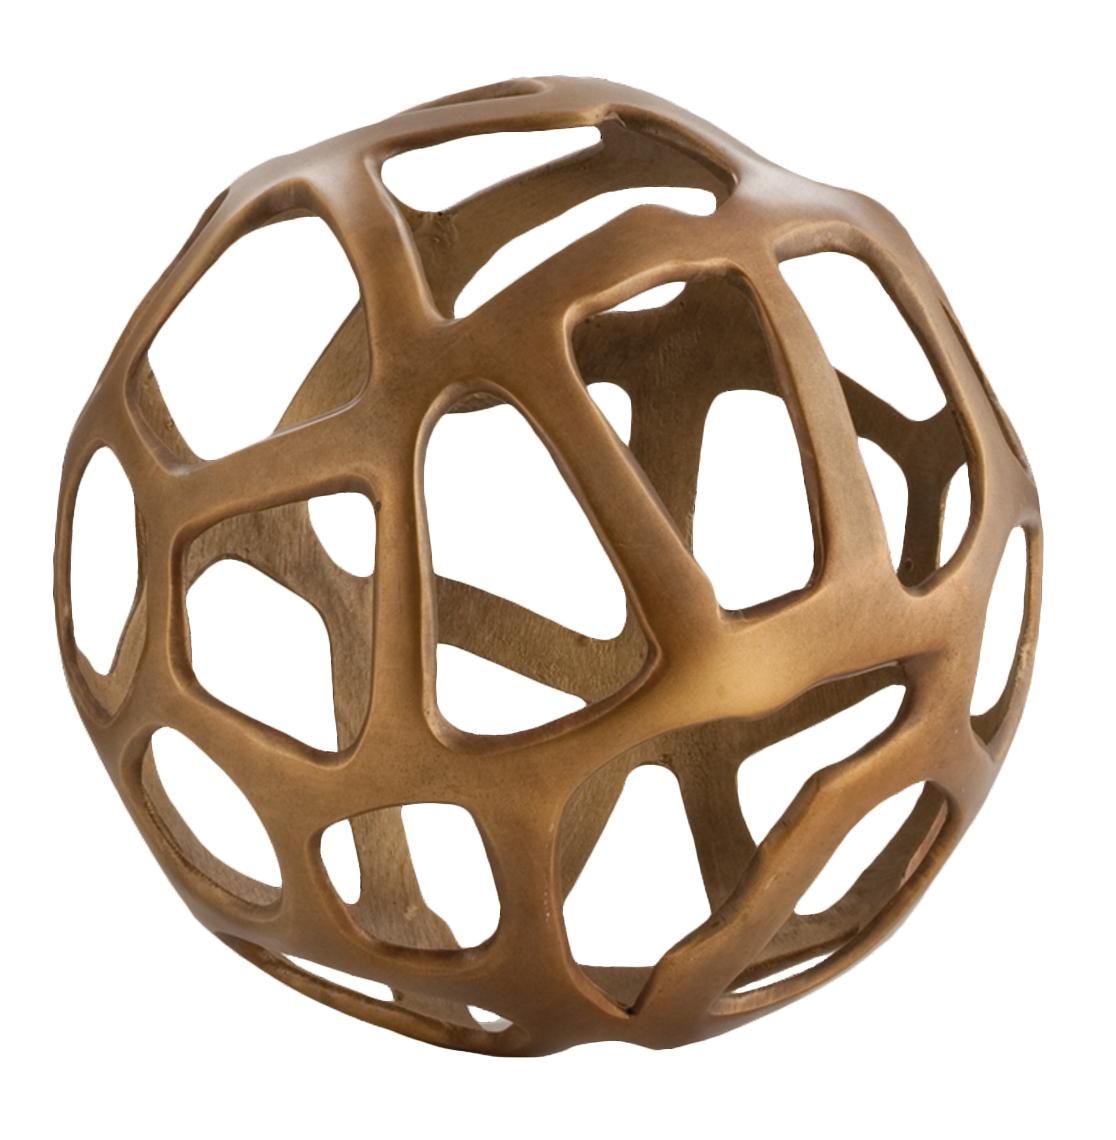 Ennis Antique Brass Web Sphere Sculpture Decor Object - 10 Inch